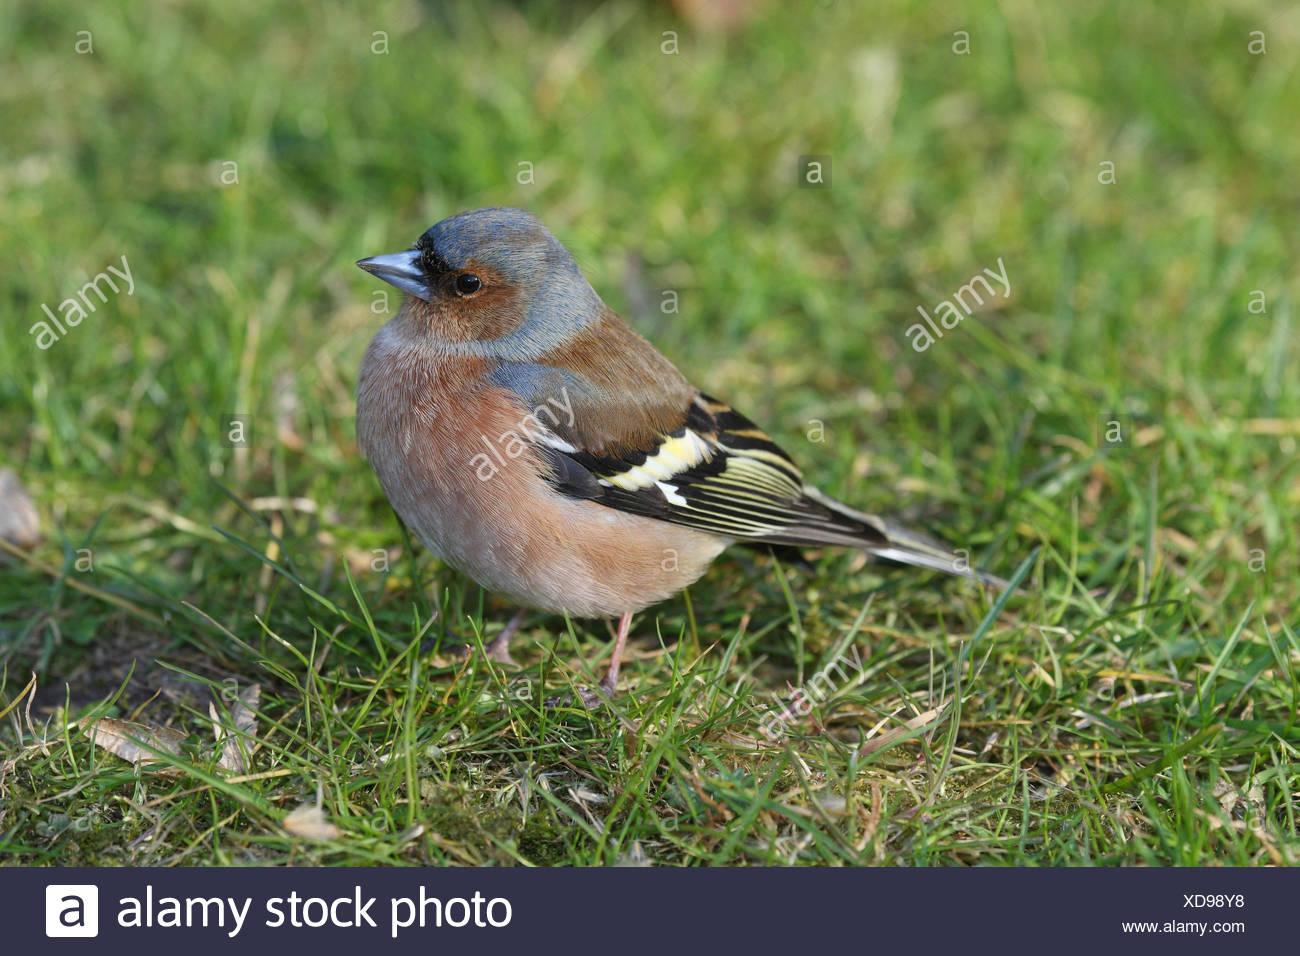 Chaffinch, Fringilla coelebs, grass, sit, - Stock Image